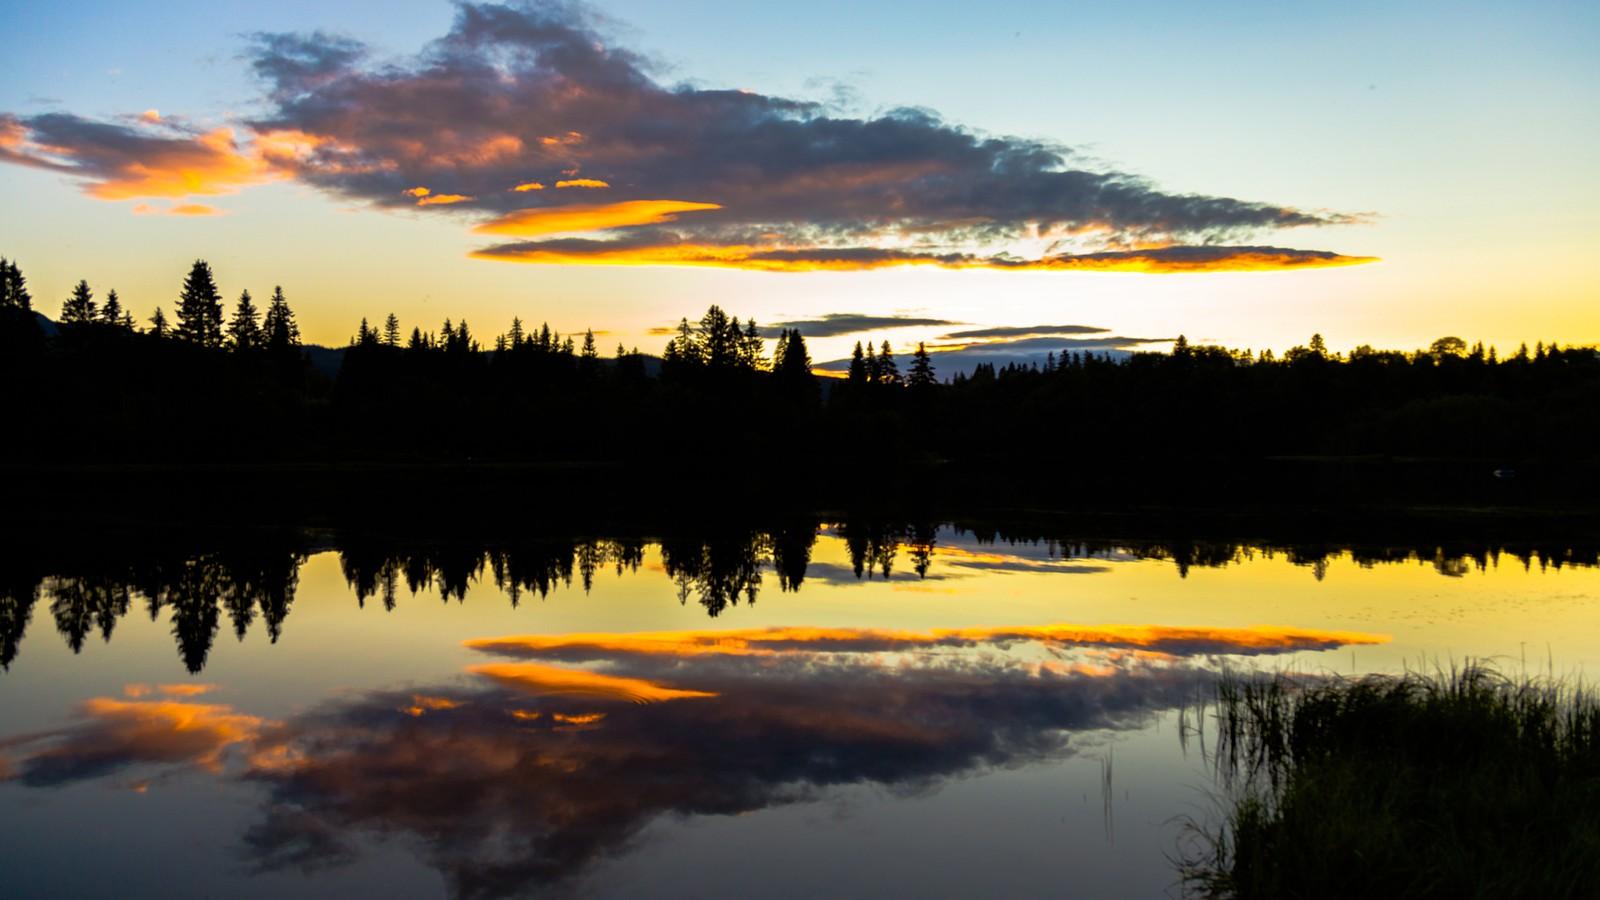 Solnedgang over Nidelva i Klæbu